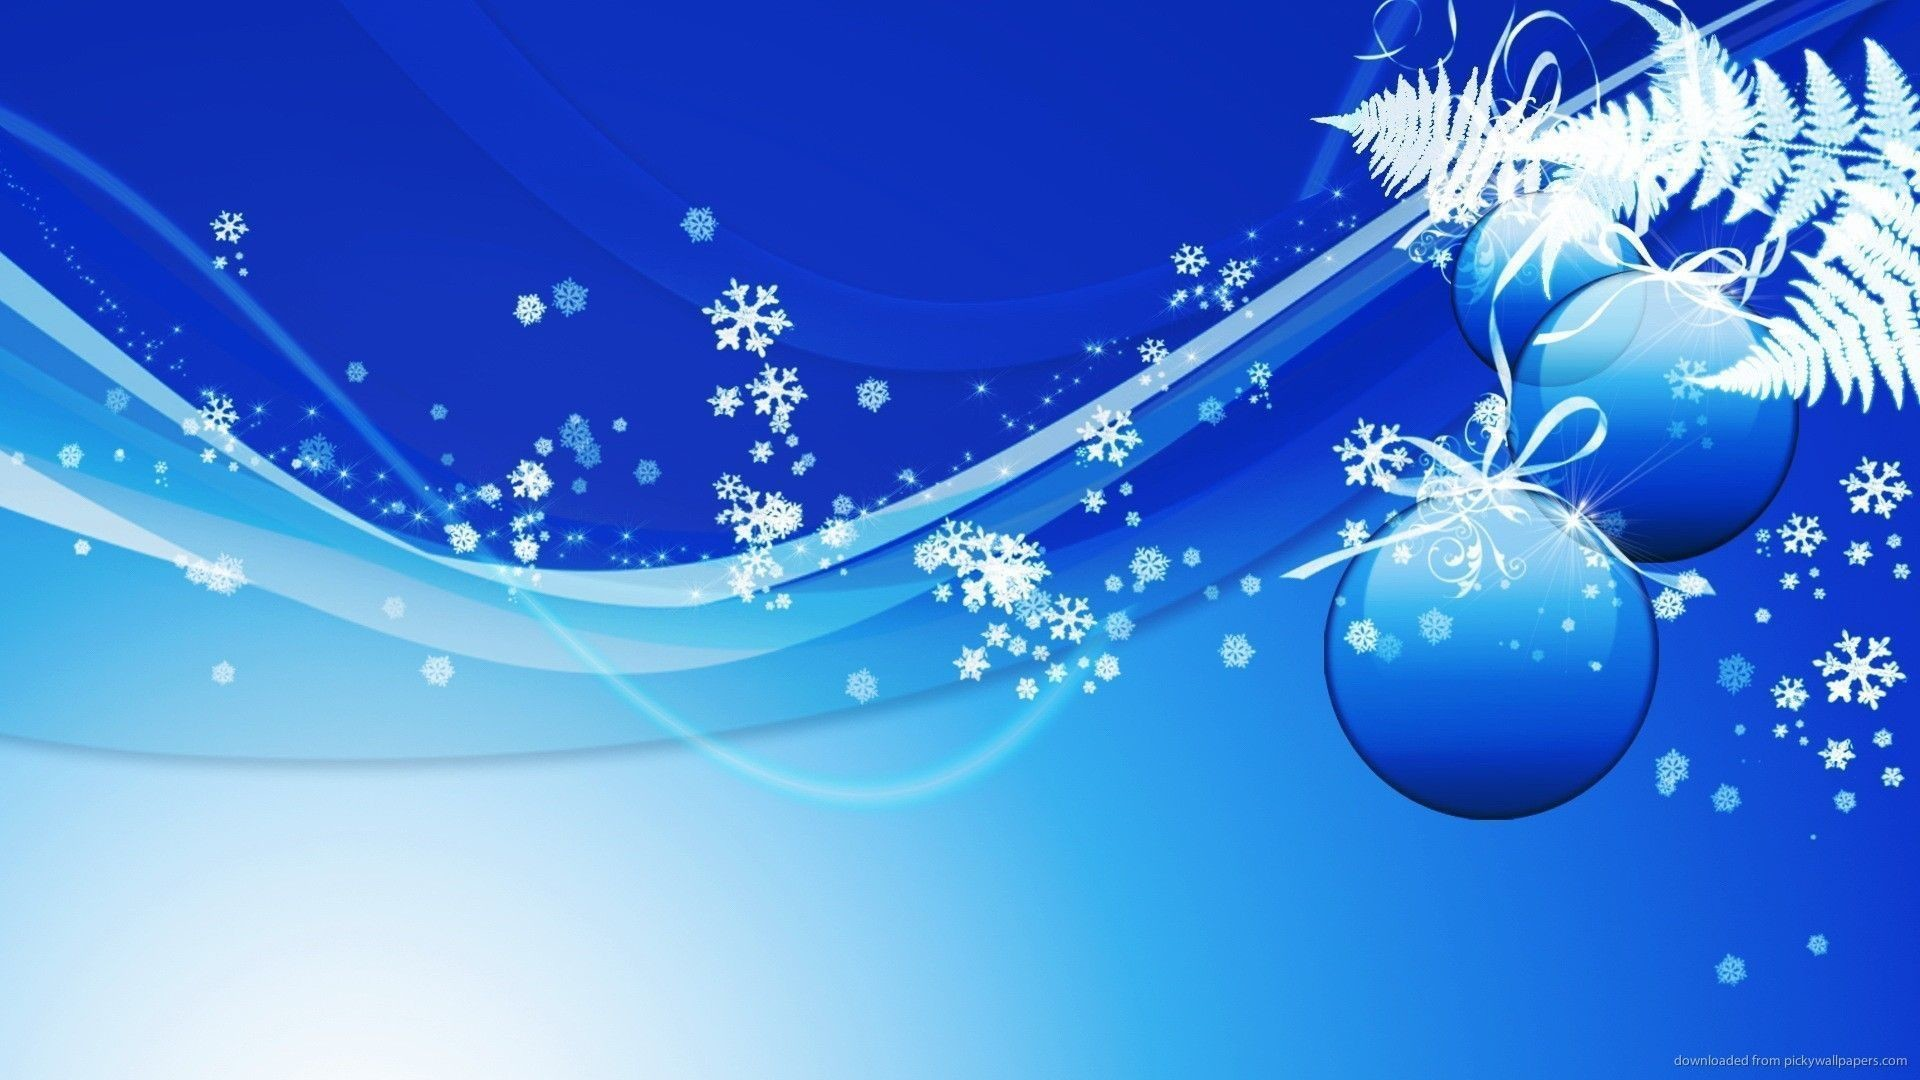 Download Blue Design Christmas Background Wallpaper